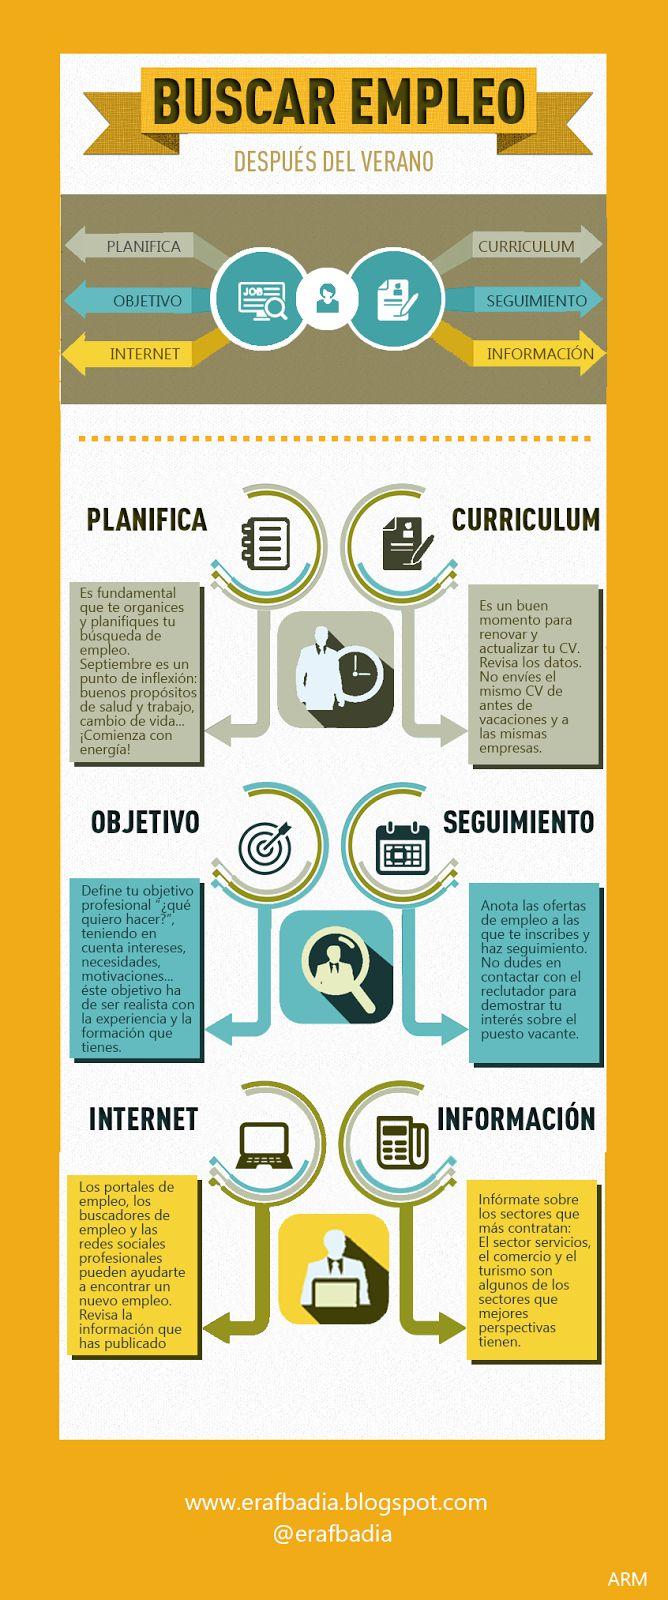 Mejores 11 imágenes de empleo en Pinterest | Empleos, Recursos ...